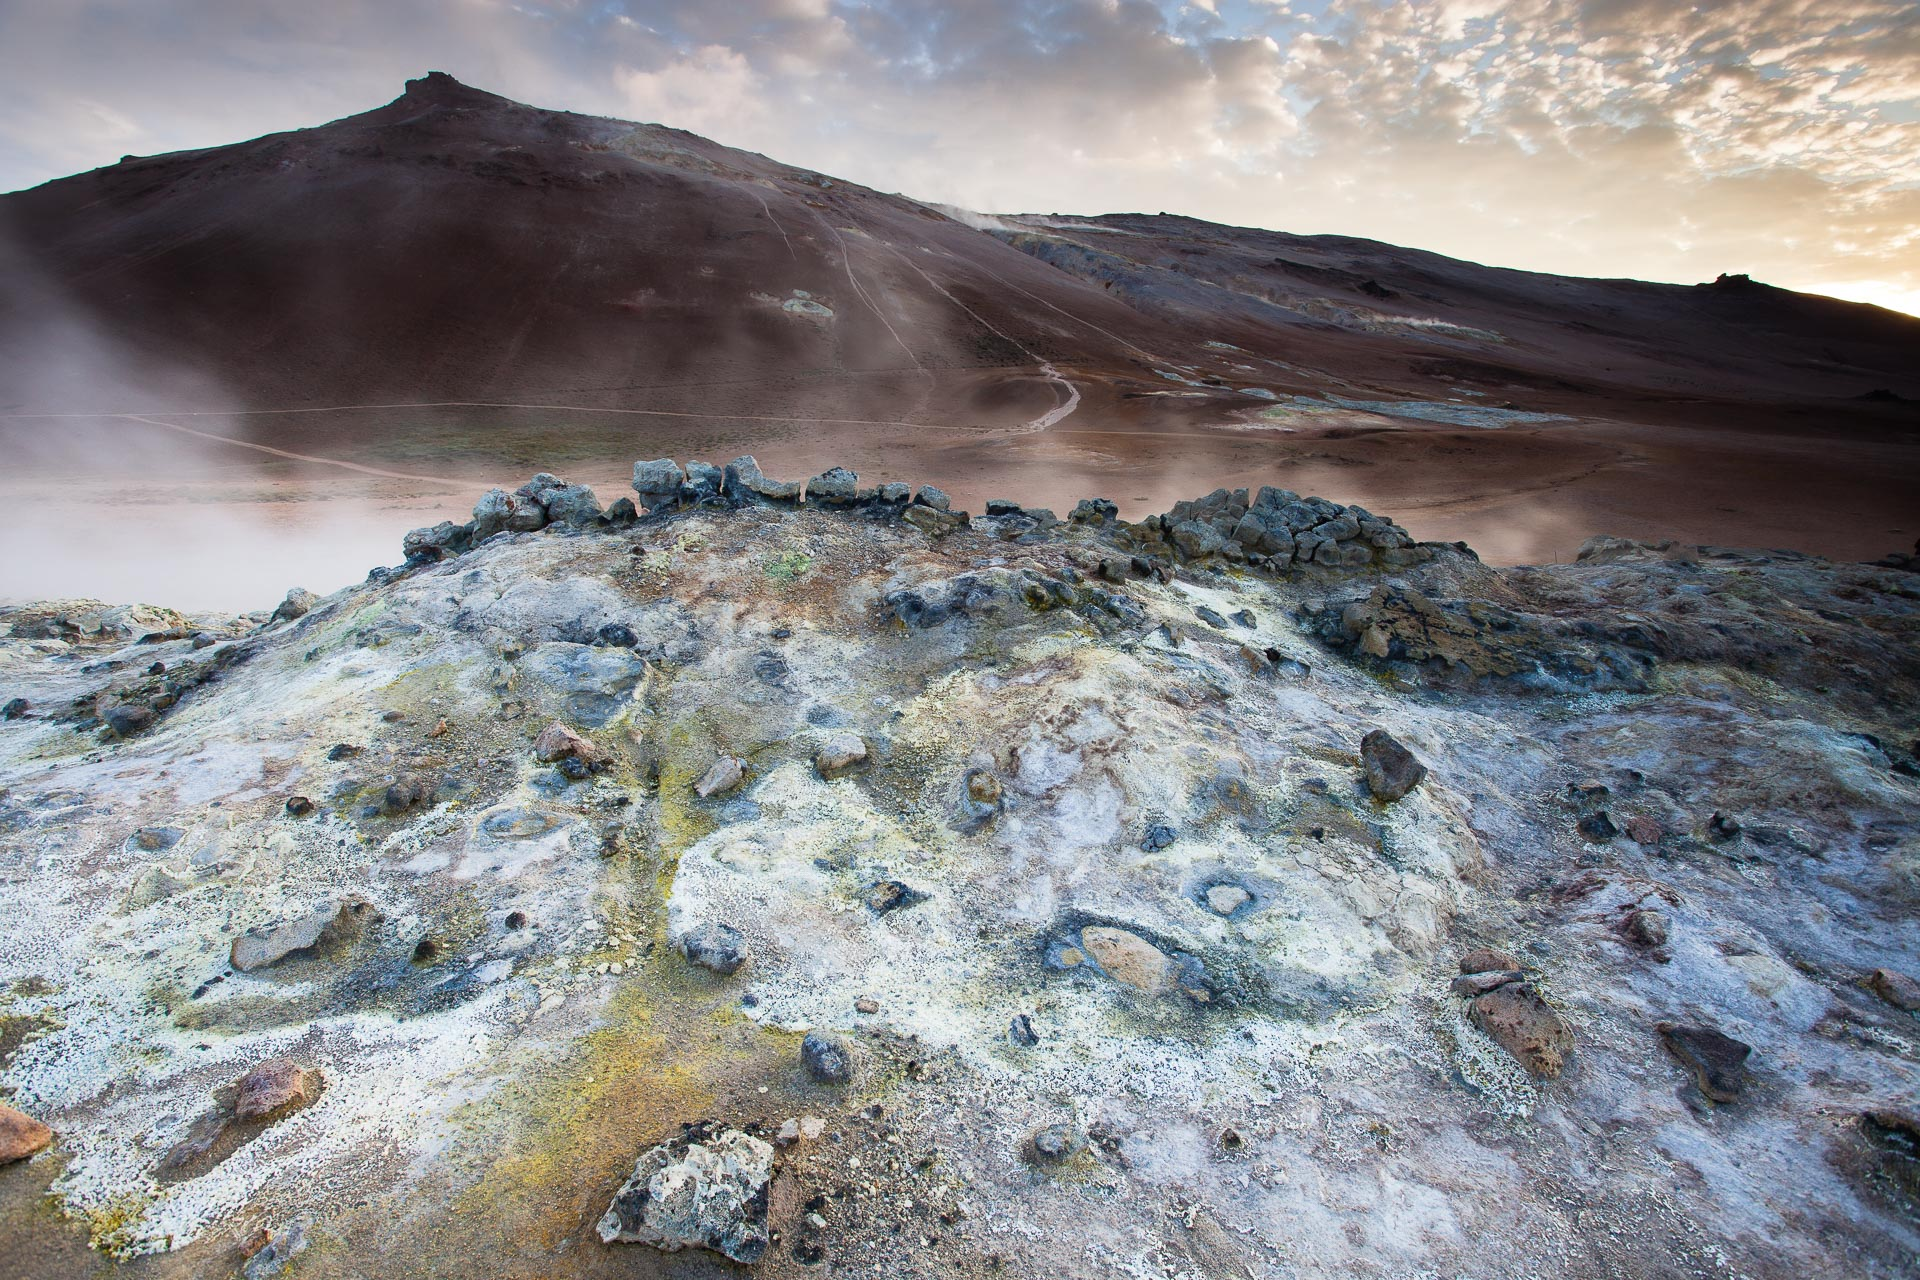 fumerolles sulfureuses à Hverarönd en Islande